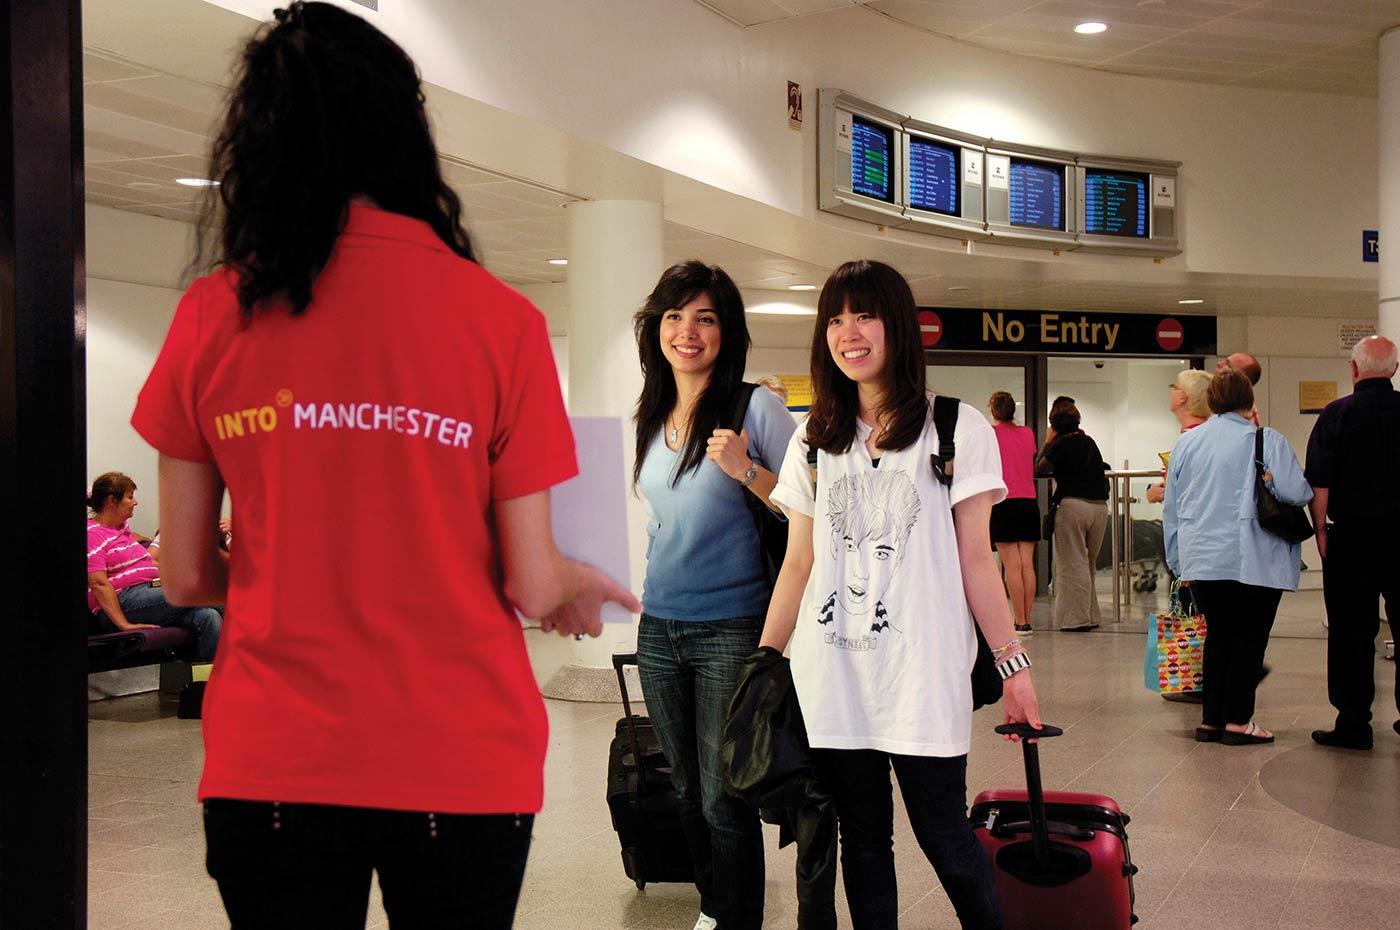 INTO-Manchester-dil-okulu-ingiltere-1.jpg